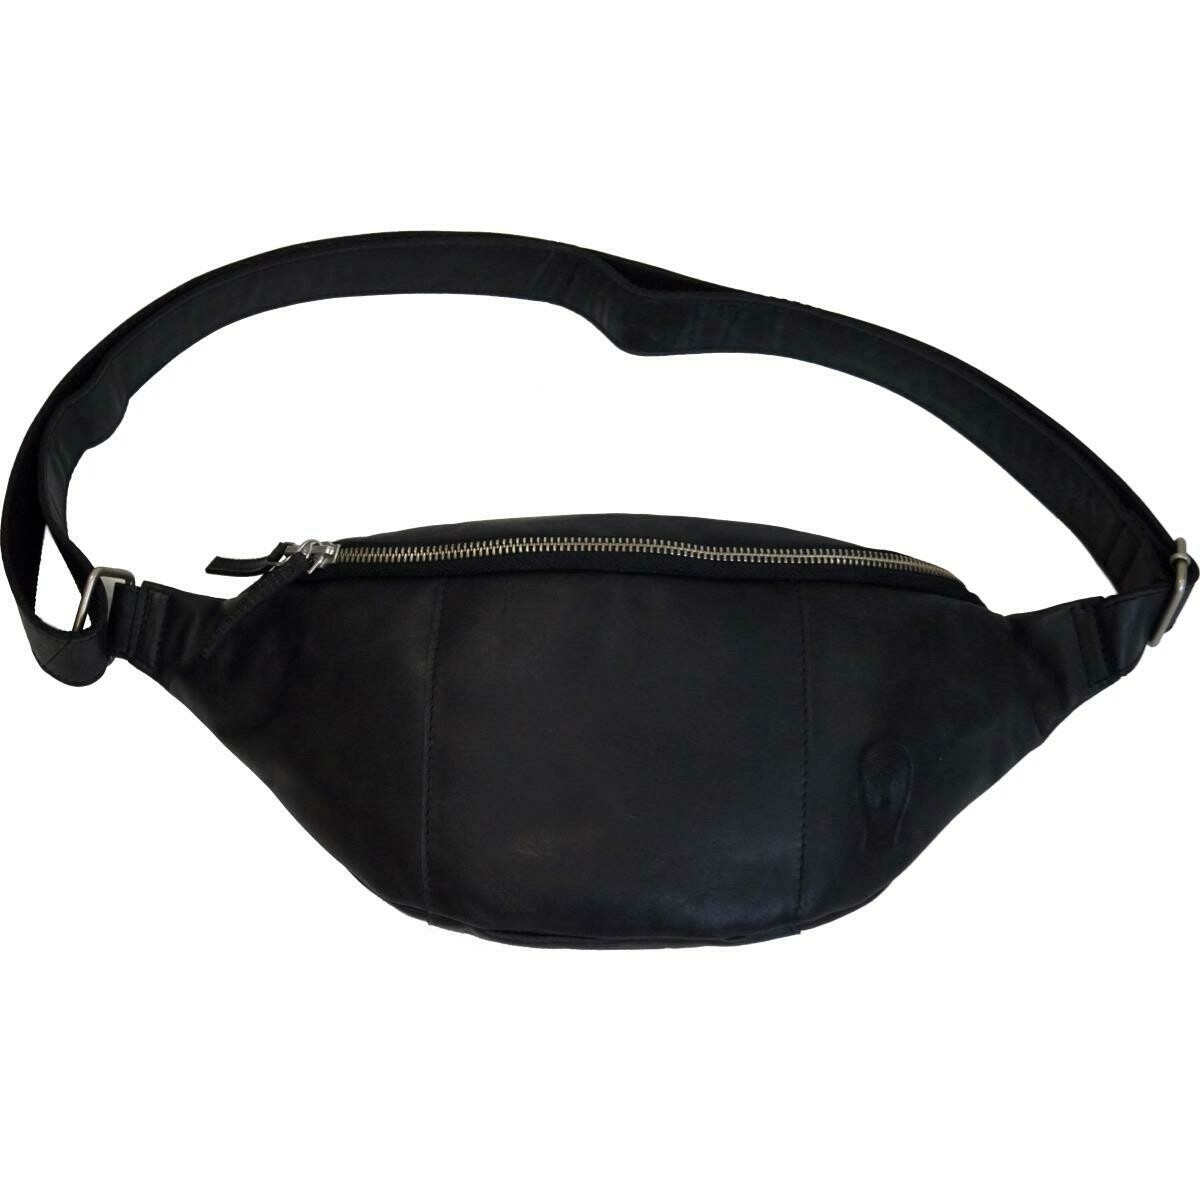 Trademark Living Bumbag - sort læder - small